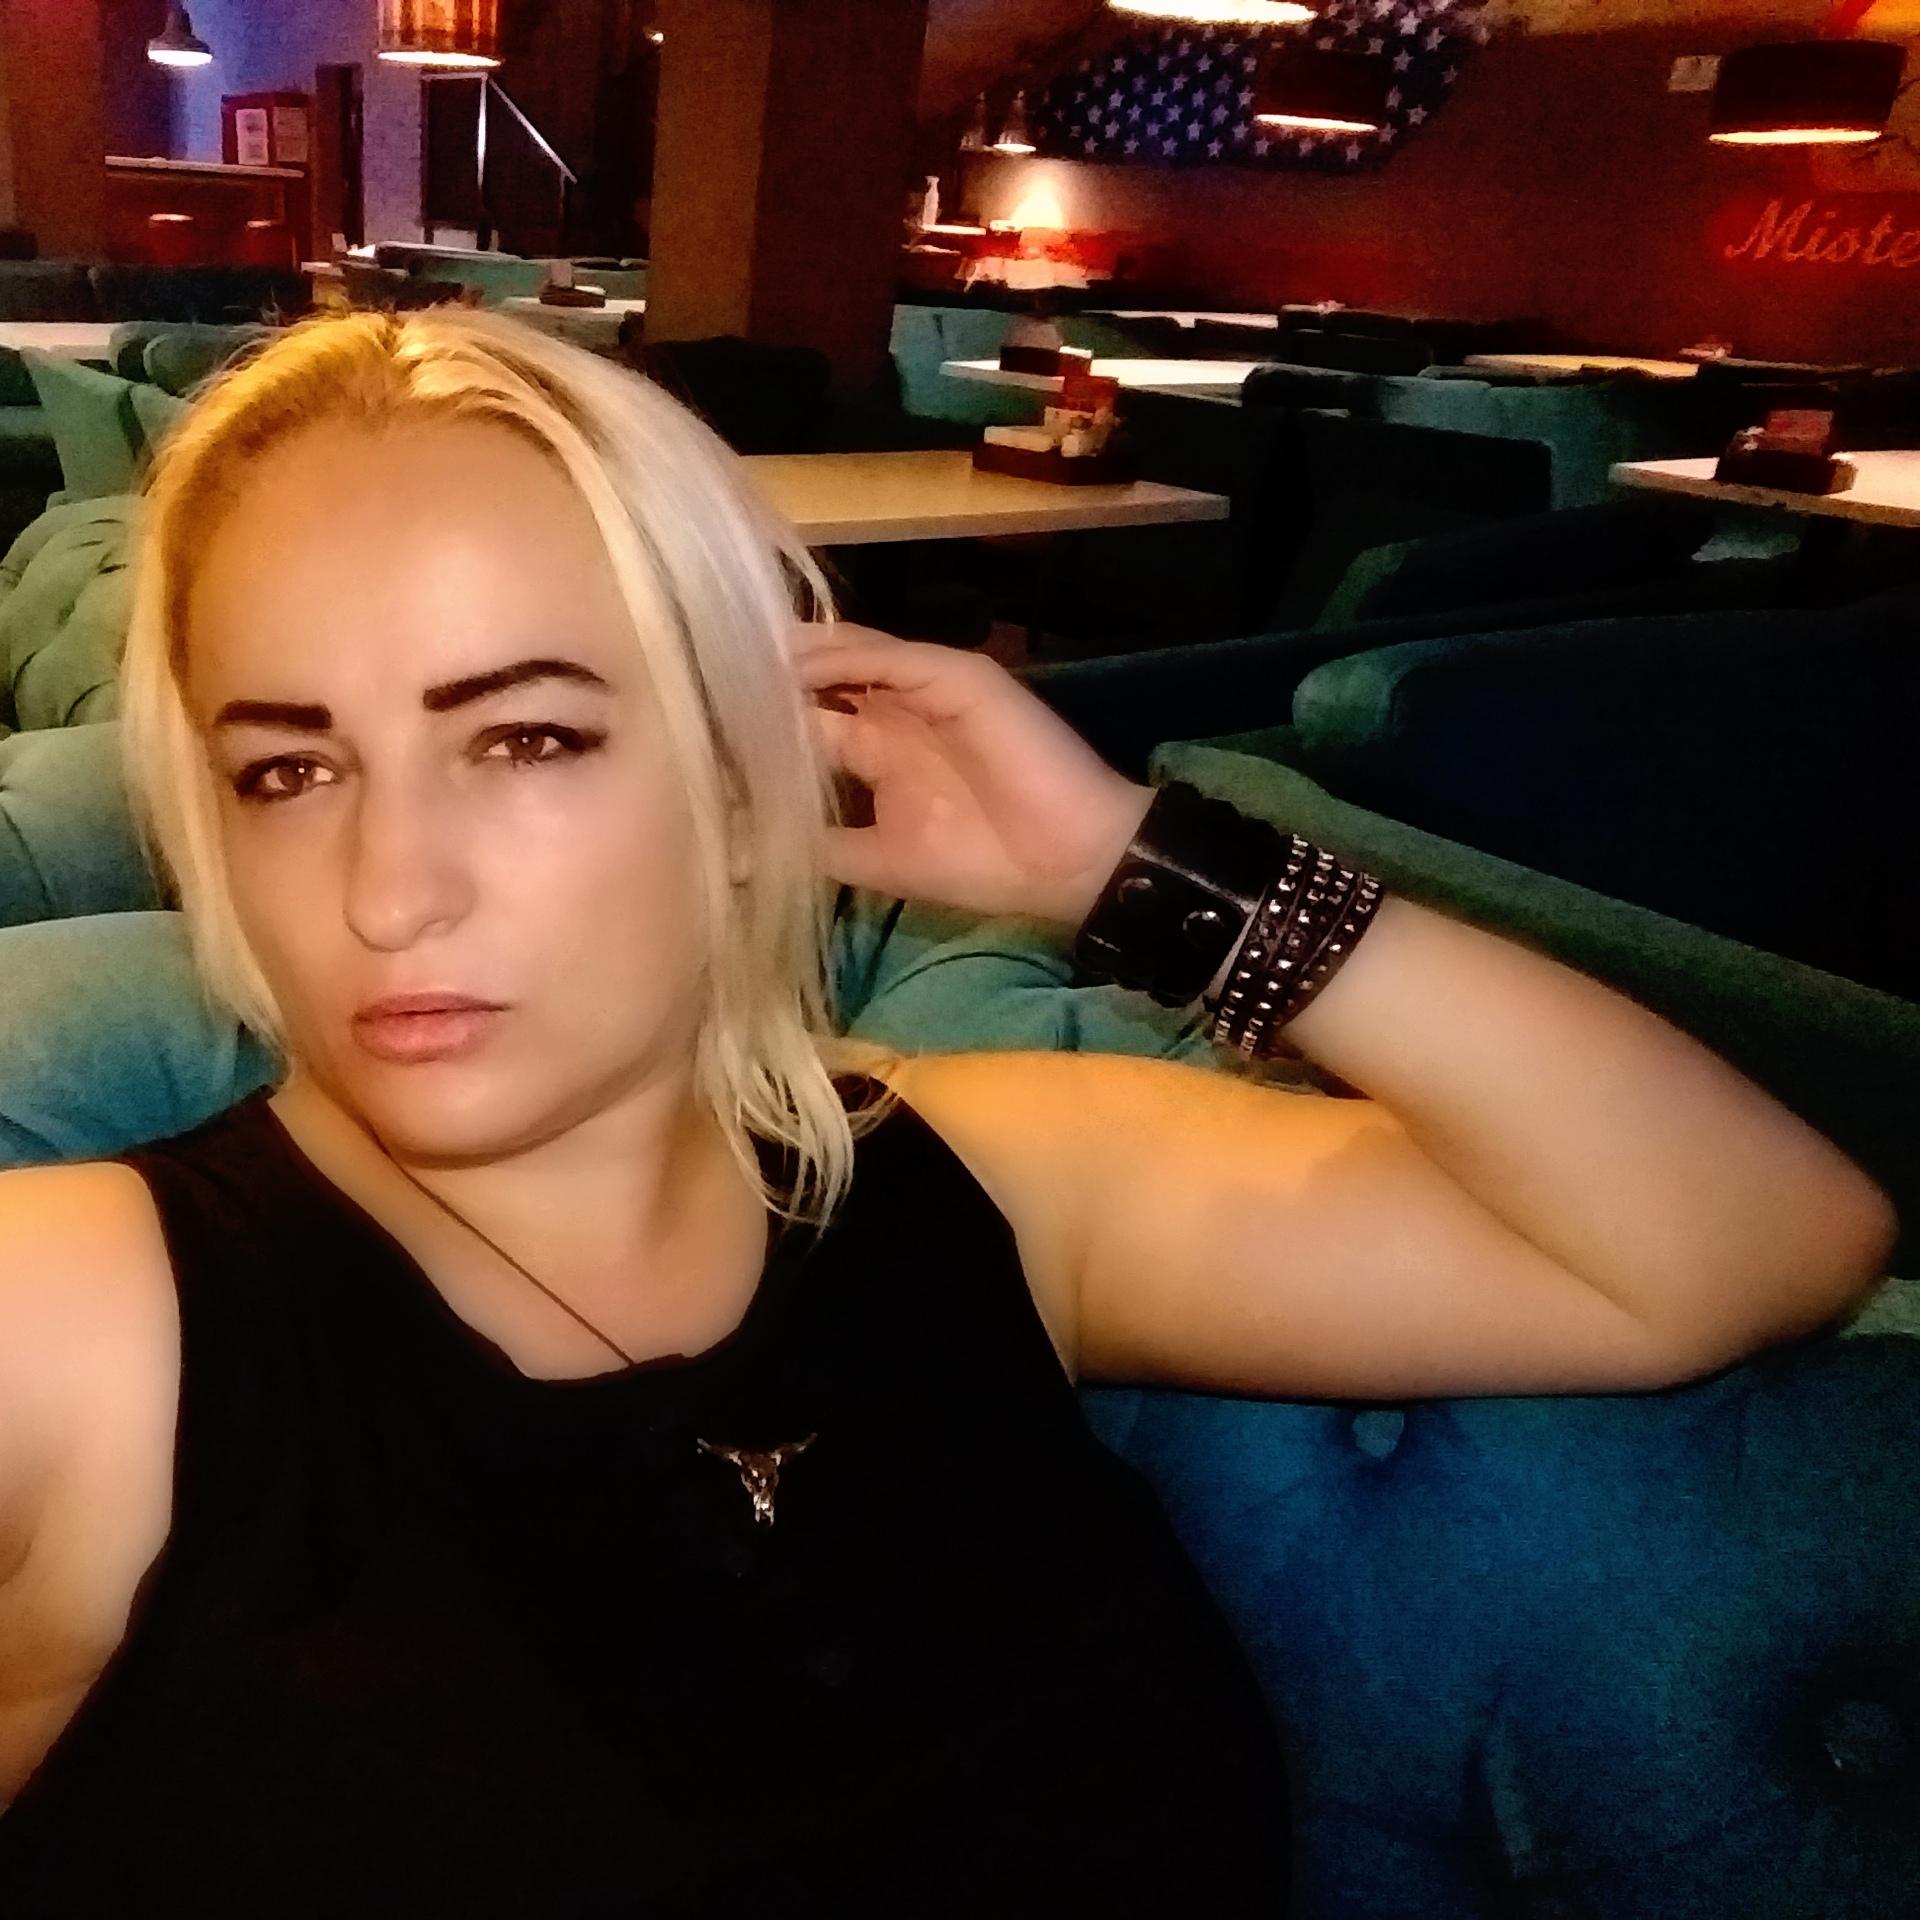 Елена Руденко (Валтея). Украина. Киев. Фото и описание.  Xcycz5j394s